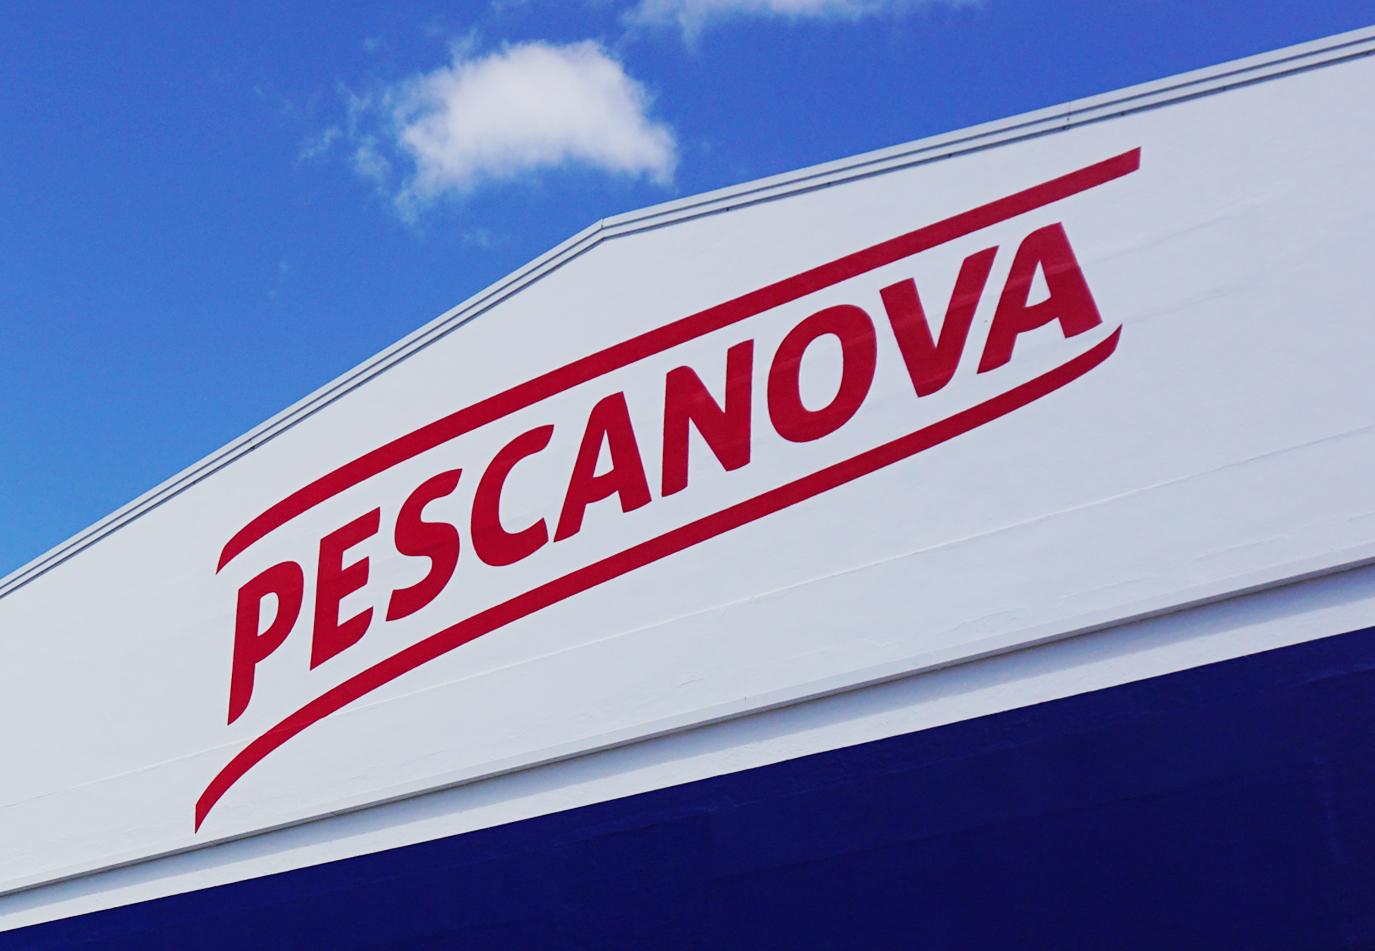 Pescanova Process